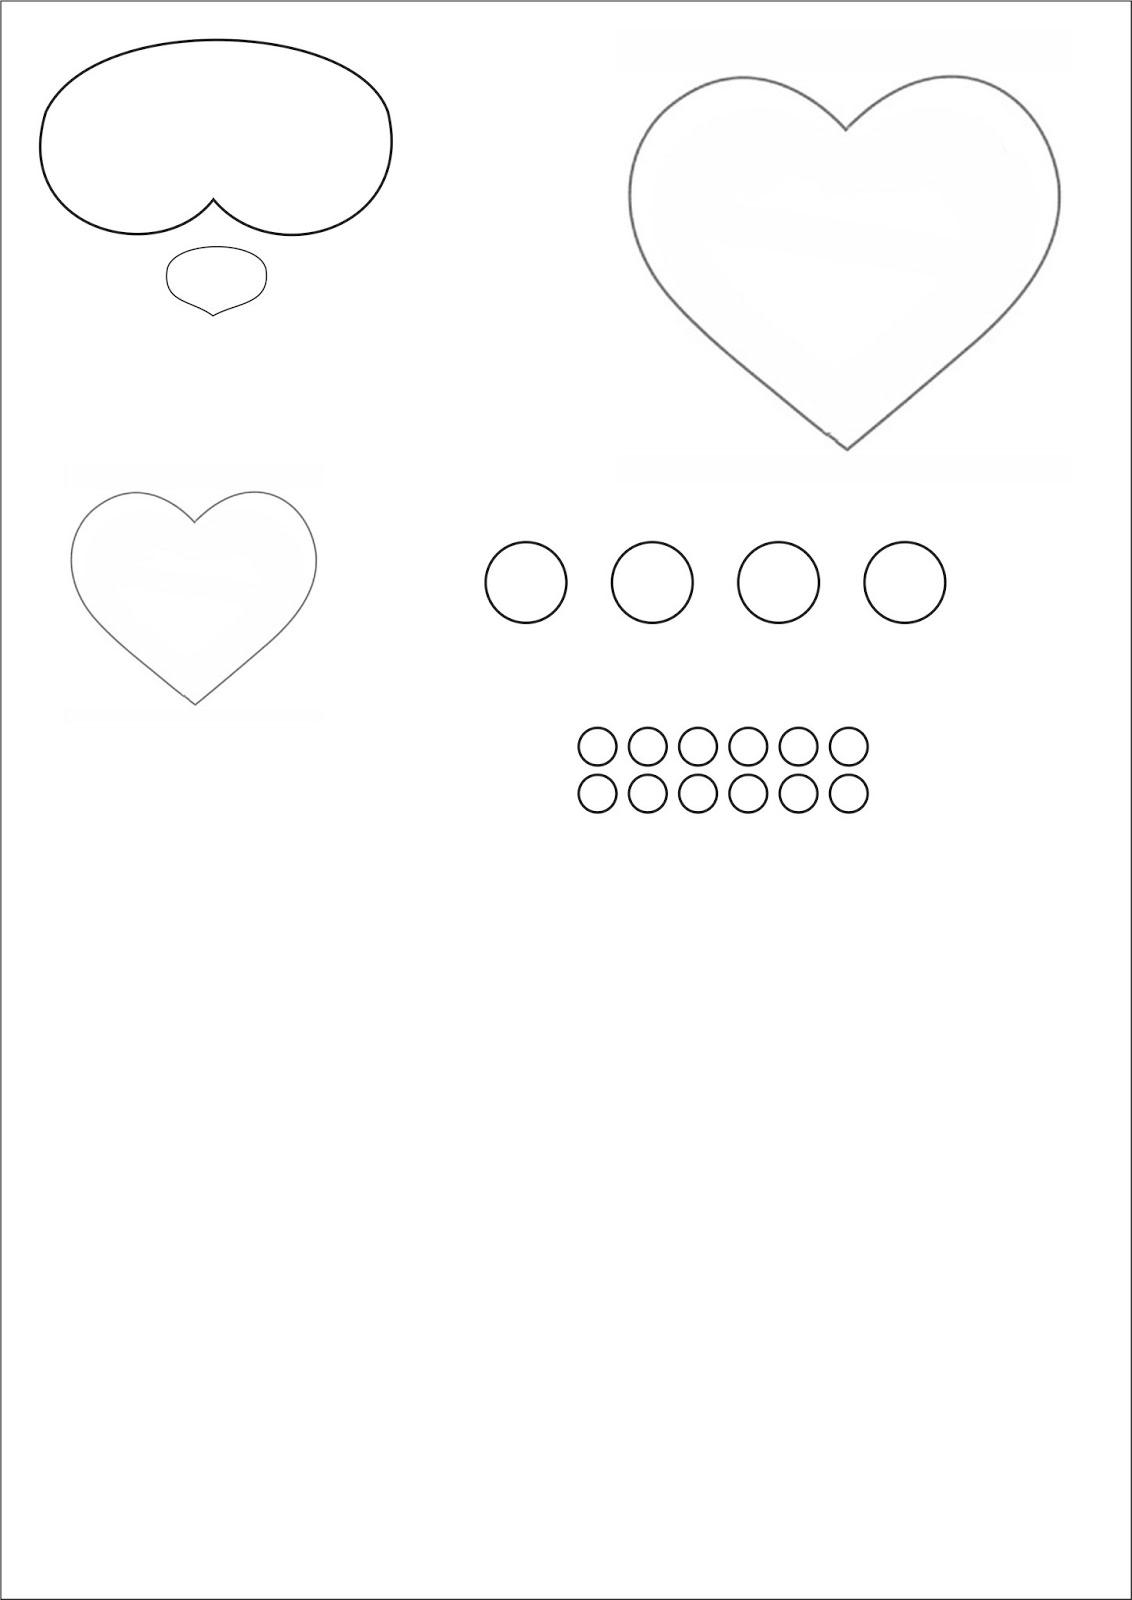 Haz click para imprimir el patron de la tarjeta osito teddy popup